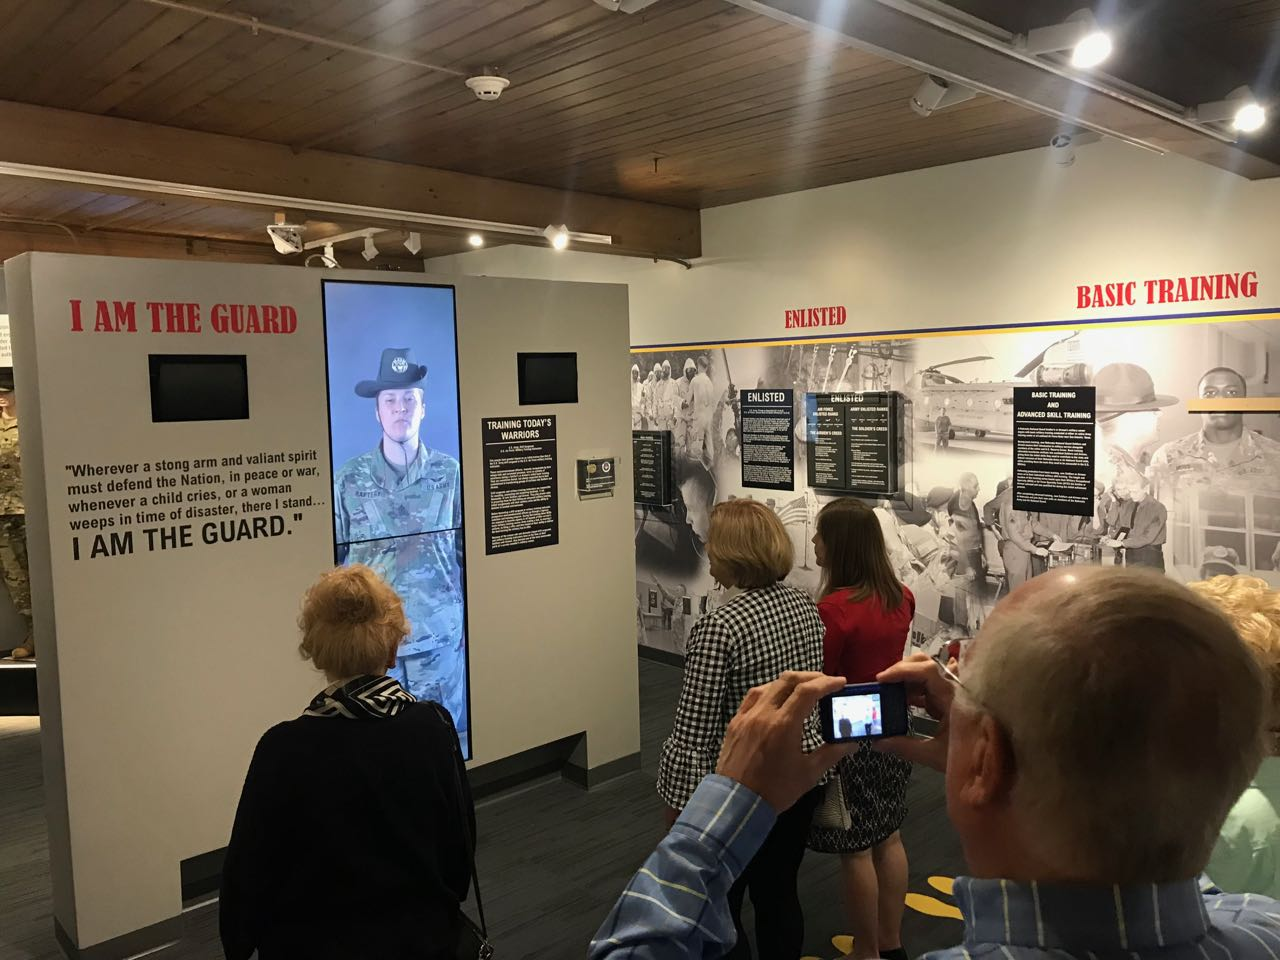 Motion-triggered video wall at the Nebraska National Guard Museum